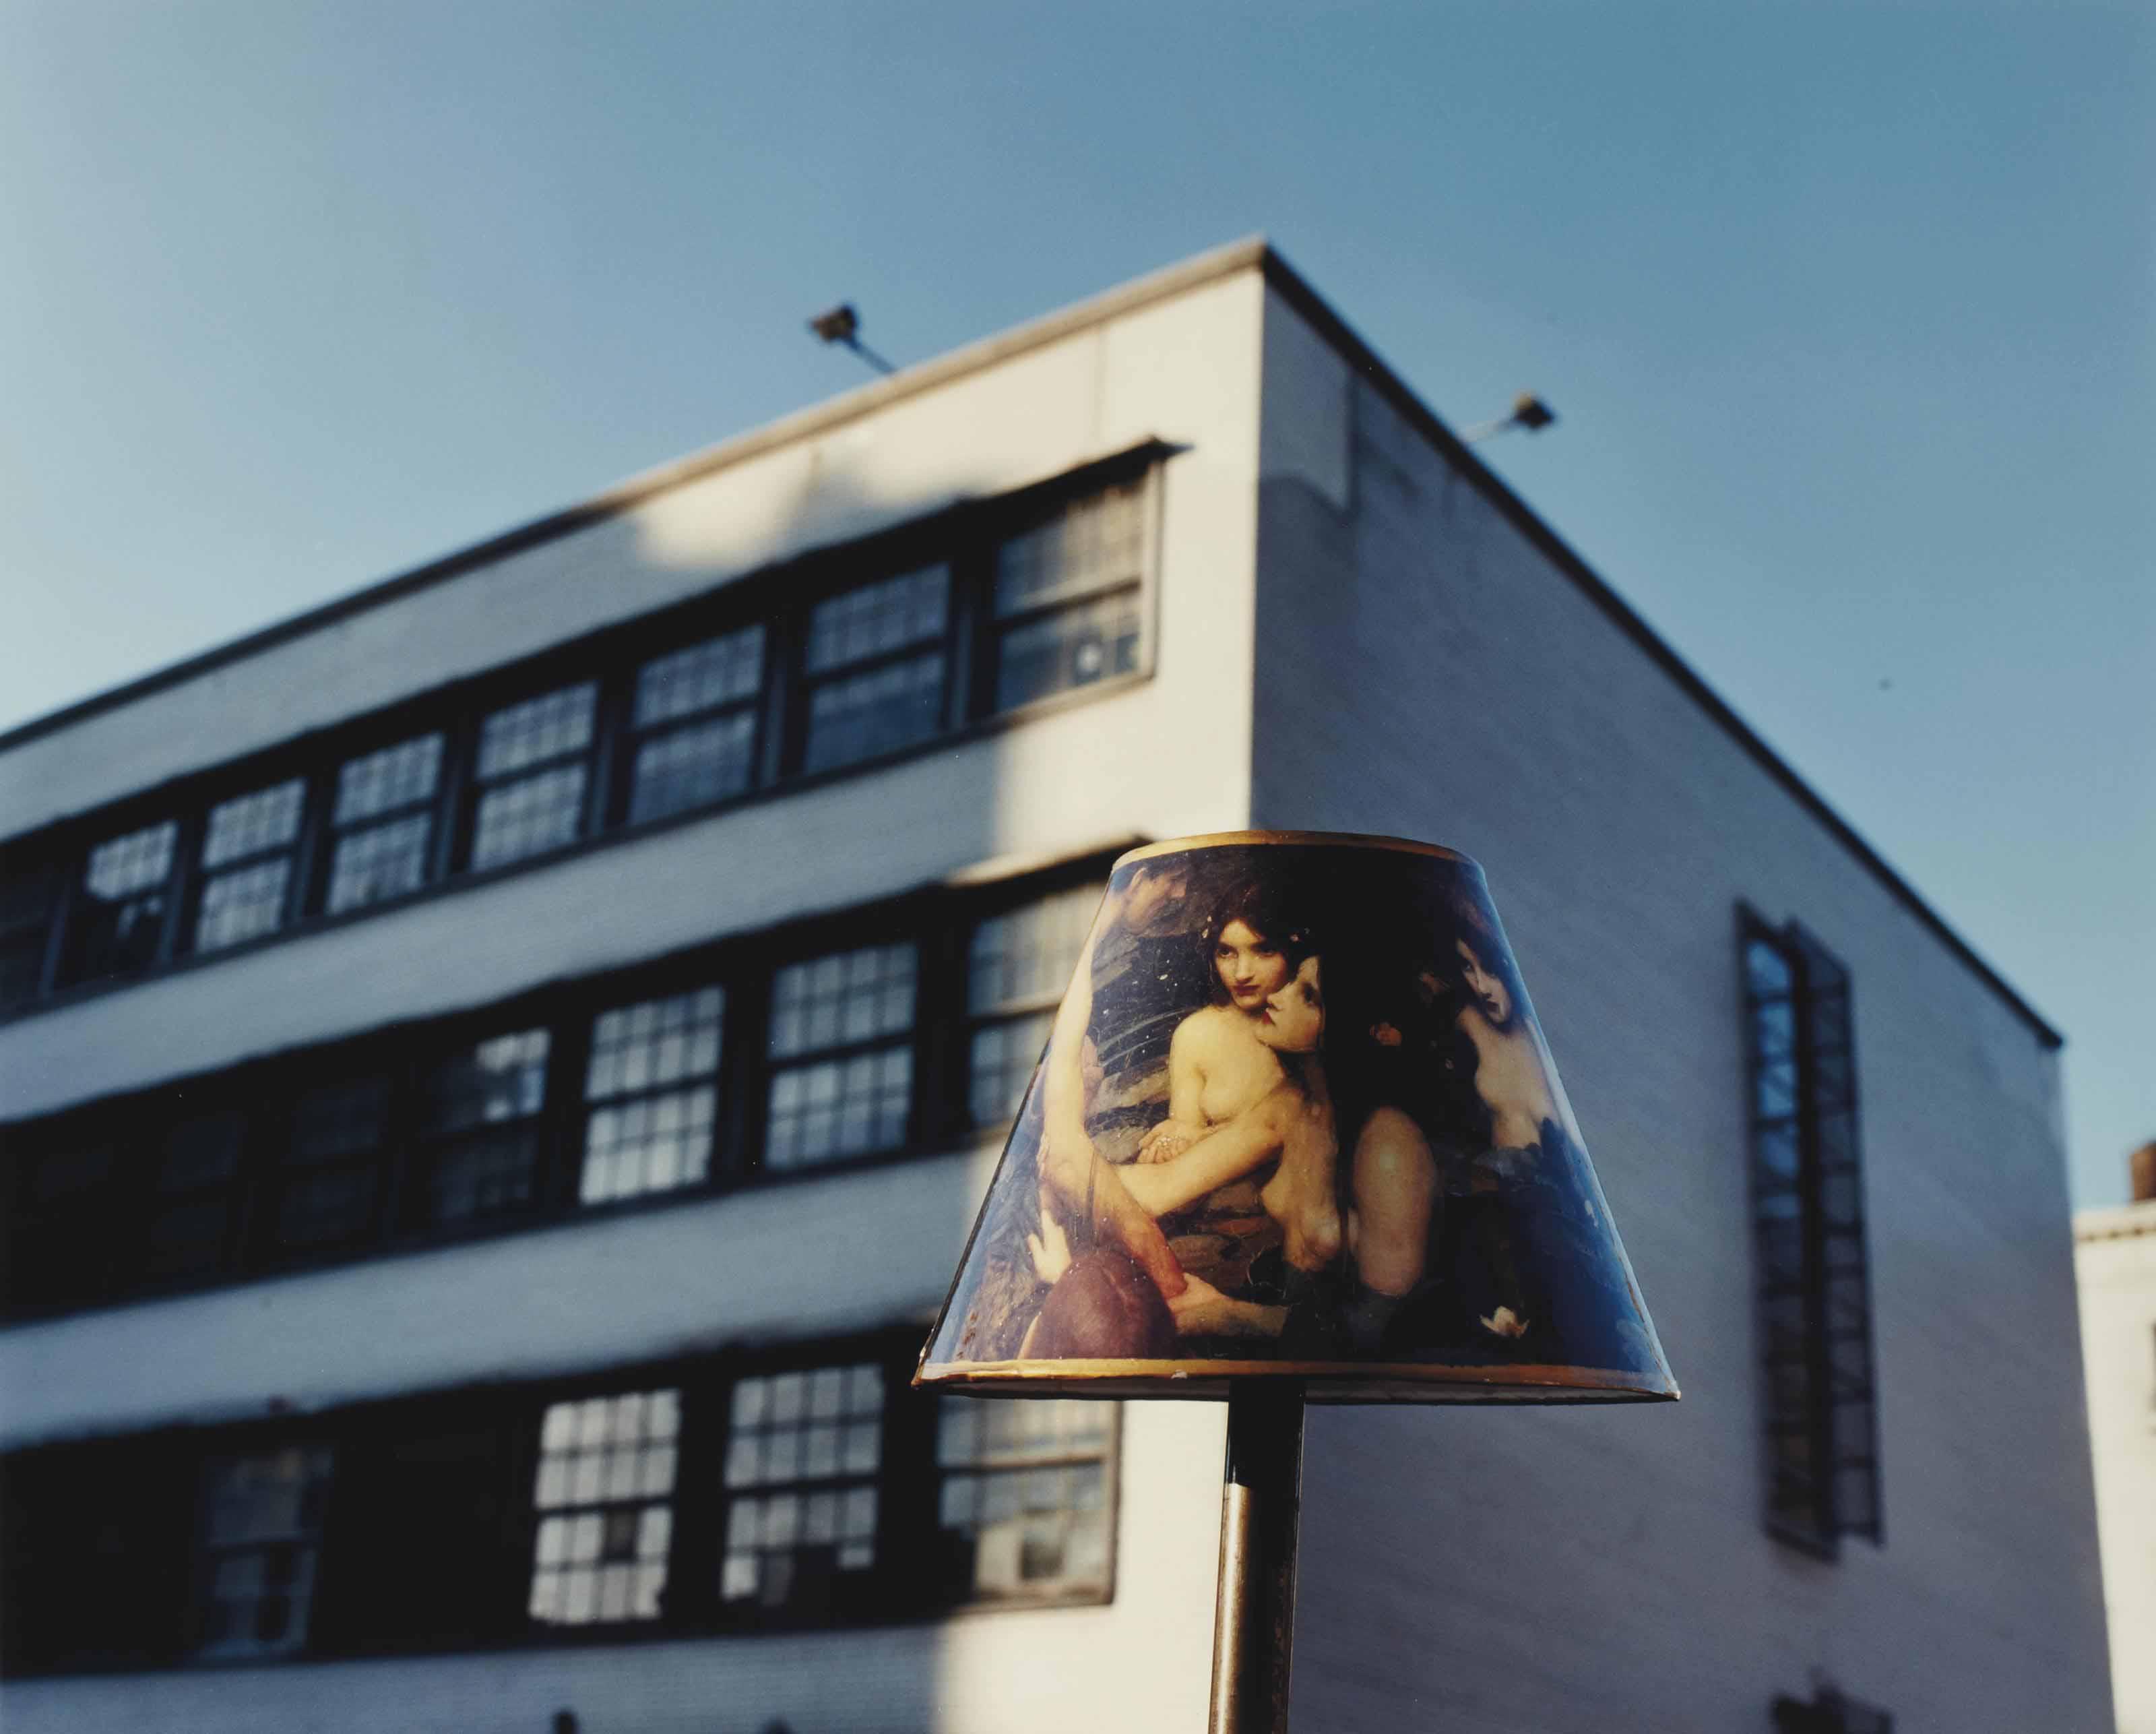 Sans titre (Lampshade of nymphus & blue sky), New York City, 1996